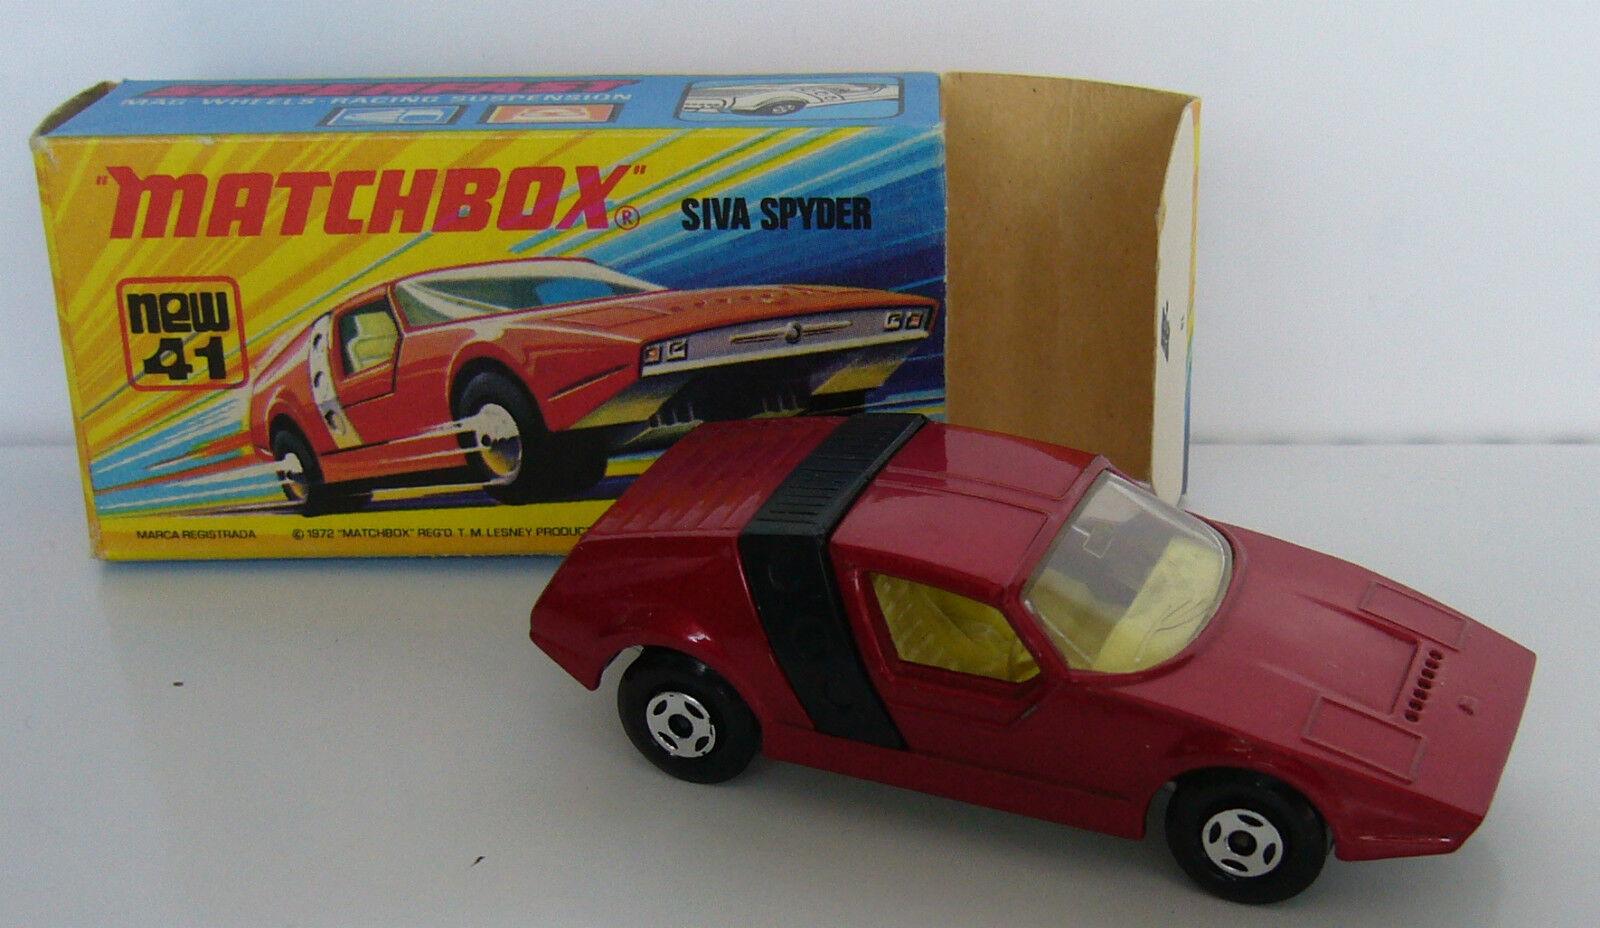 MATCHBOX-SUPERFAST-MB 41 Siva Spyder-Neuf dans sa boîte -